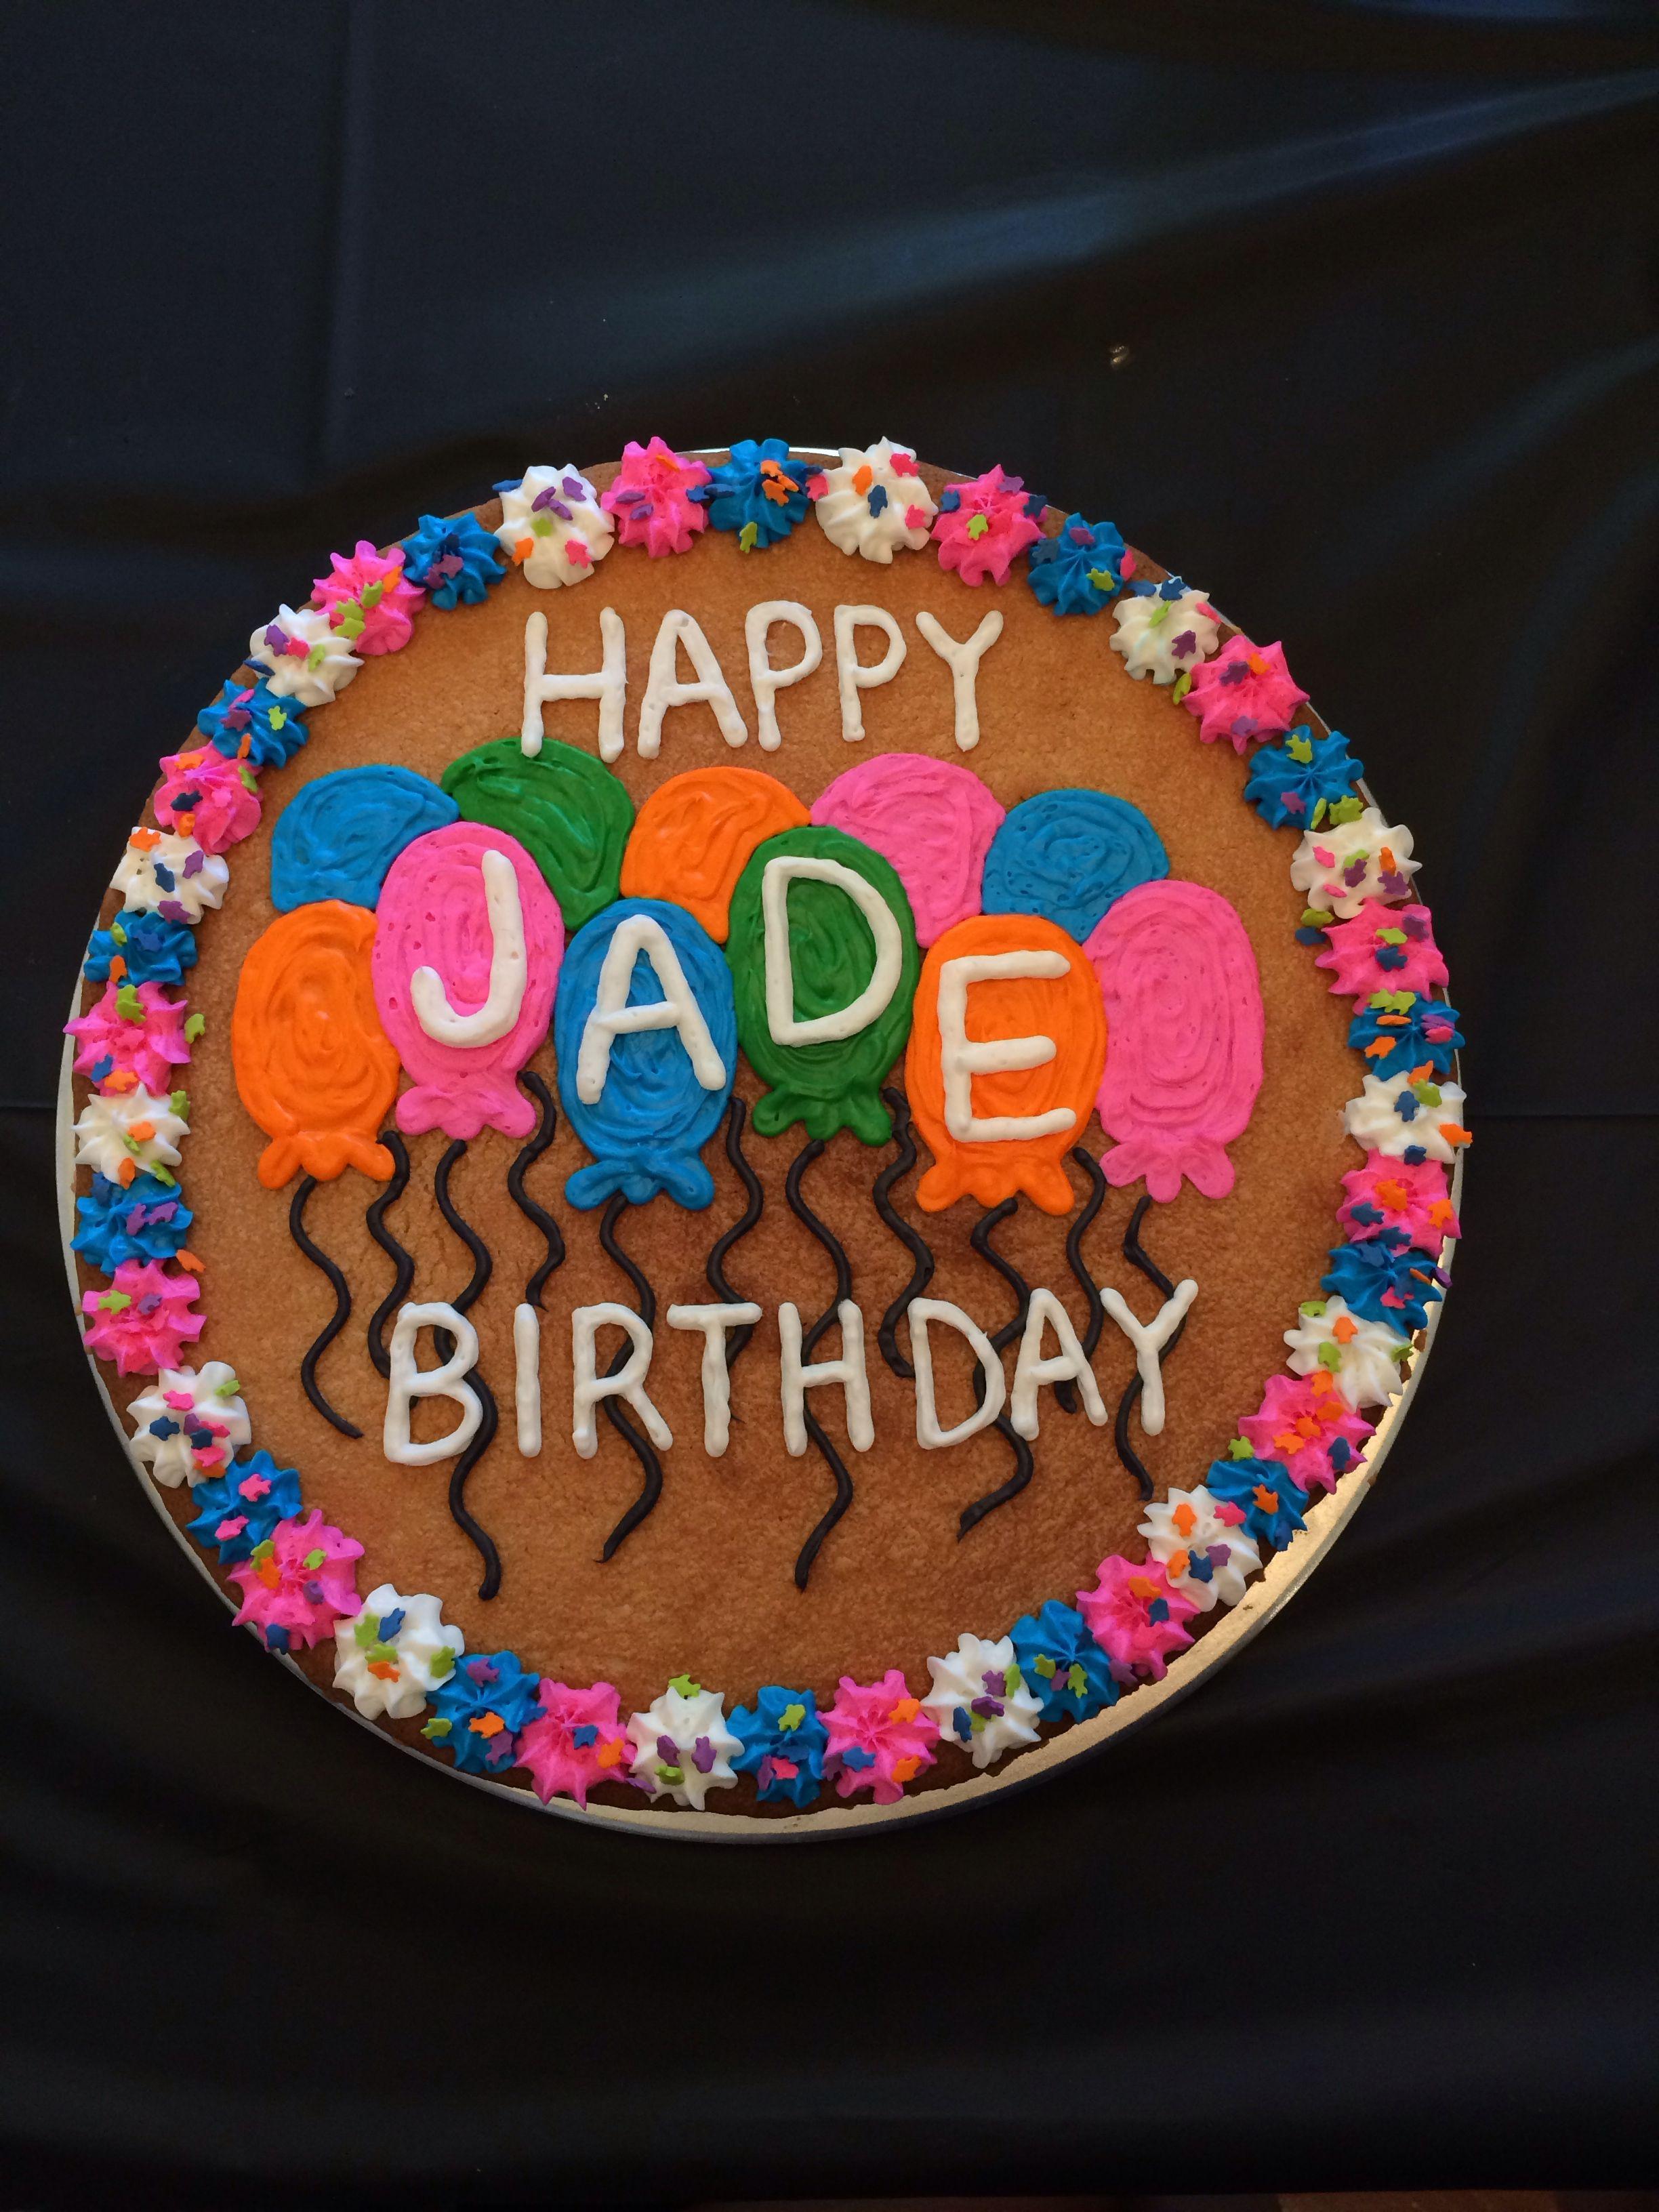 Happy Birthday Jade Made By Alex Duncan